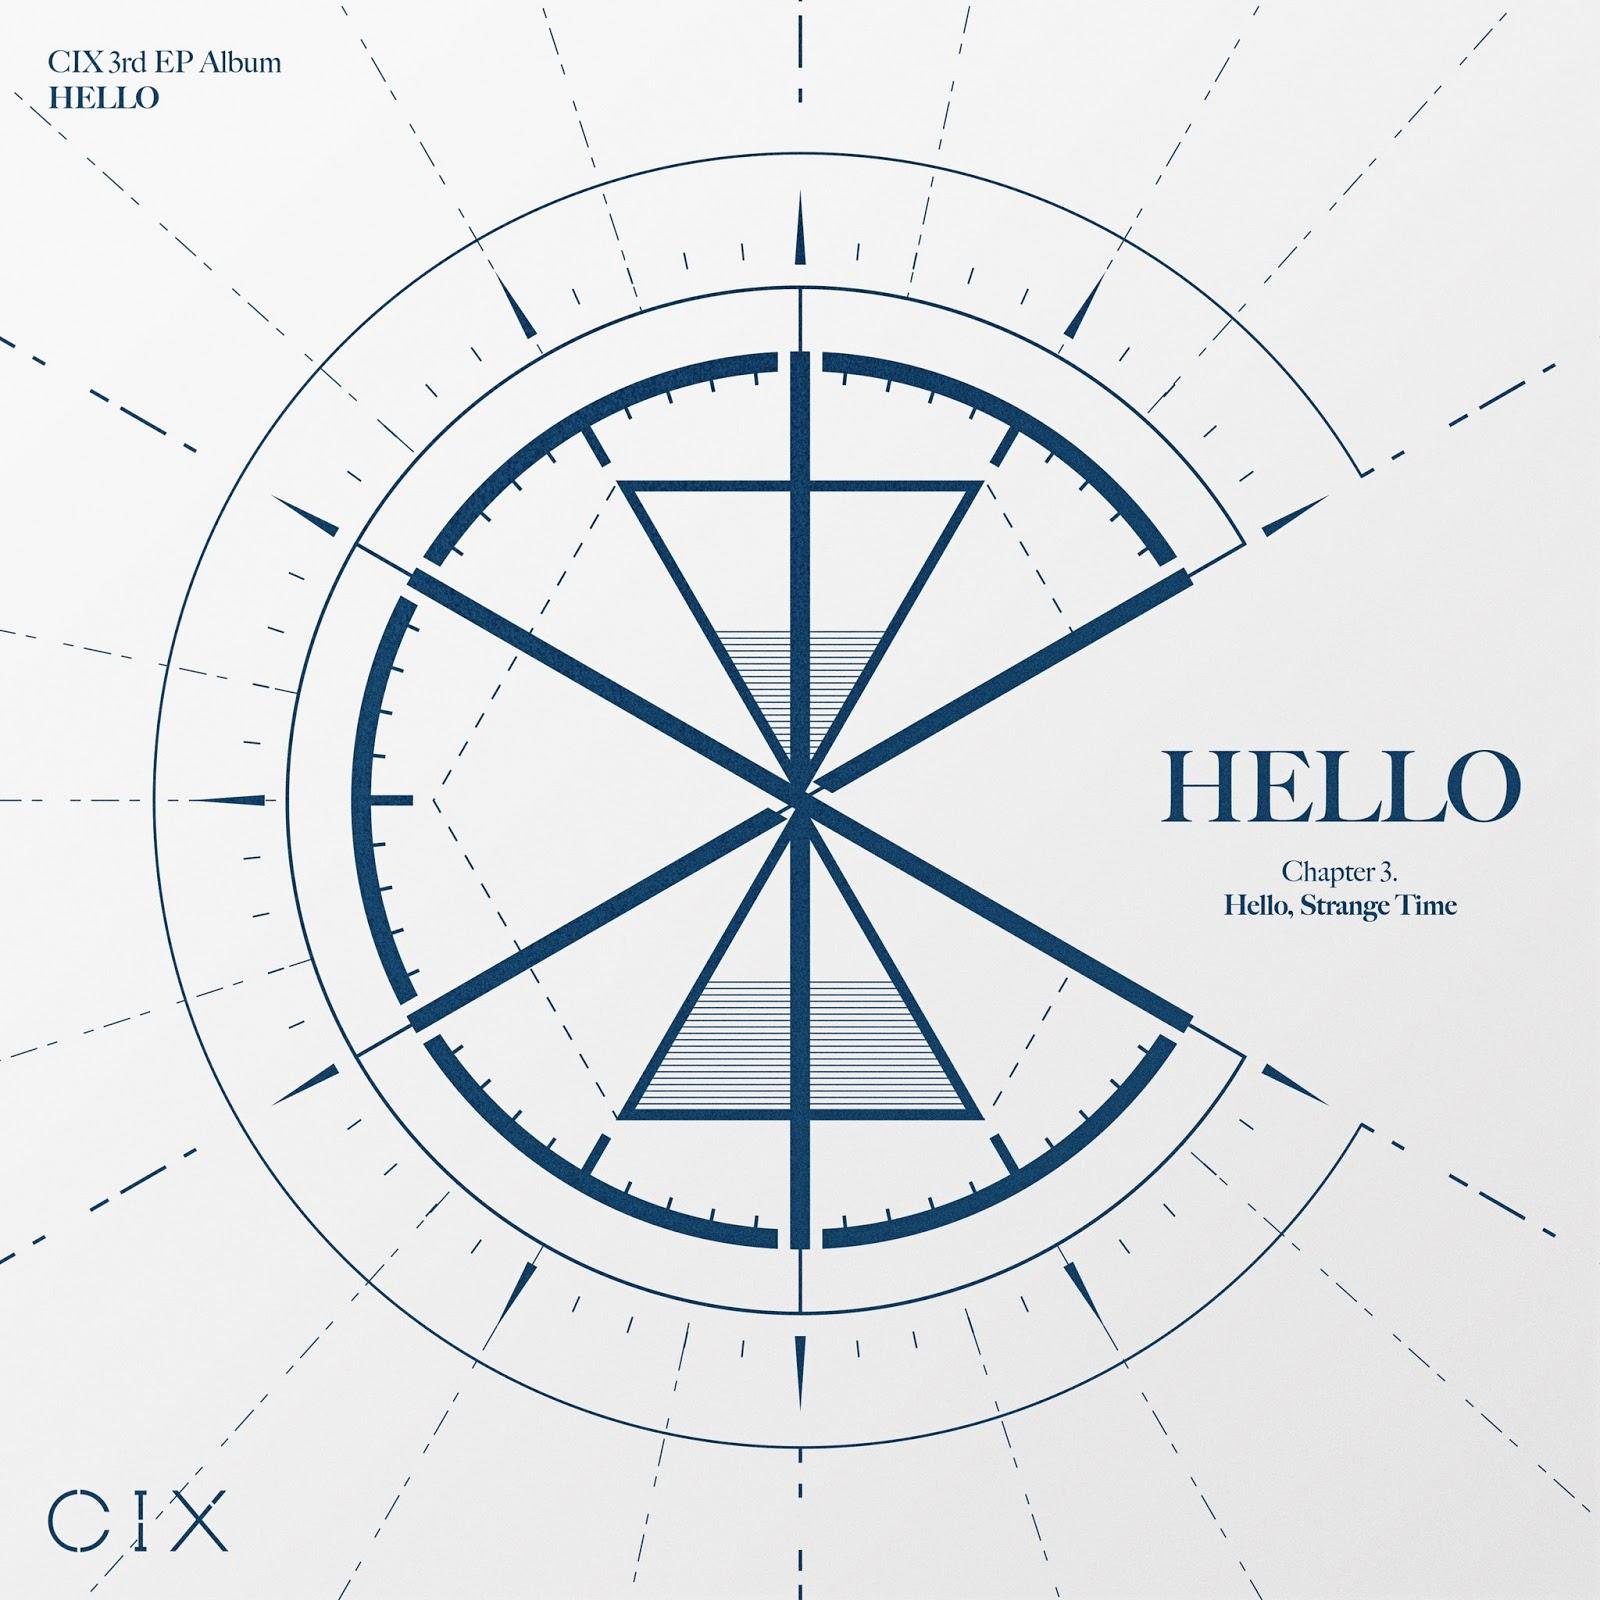 CIX 'HELLO' Chapter 3. Hello, Strange Time